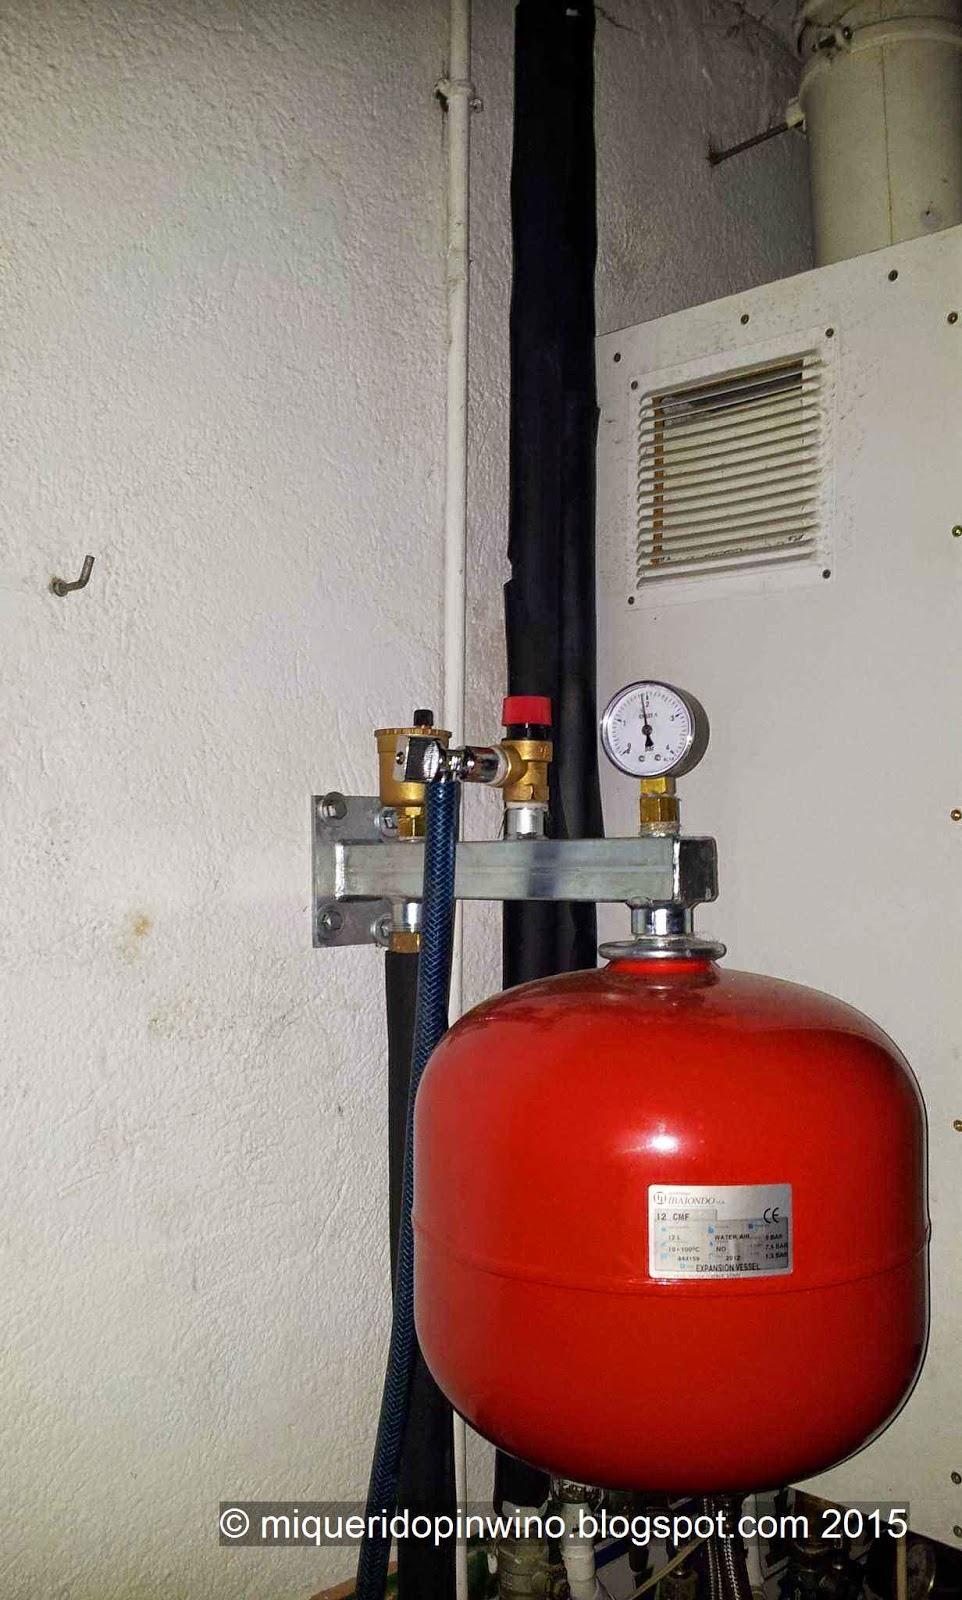 Tecnolog a para un progreso sostenible c mo aprovechar - Calefaccion lena radiadores ...